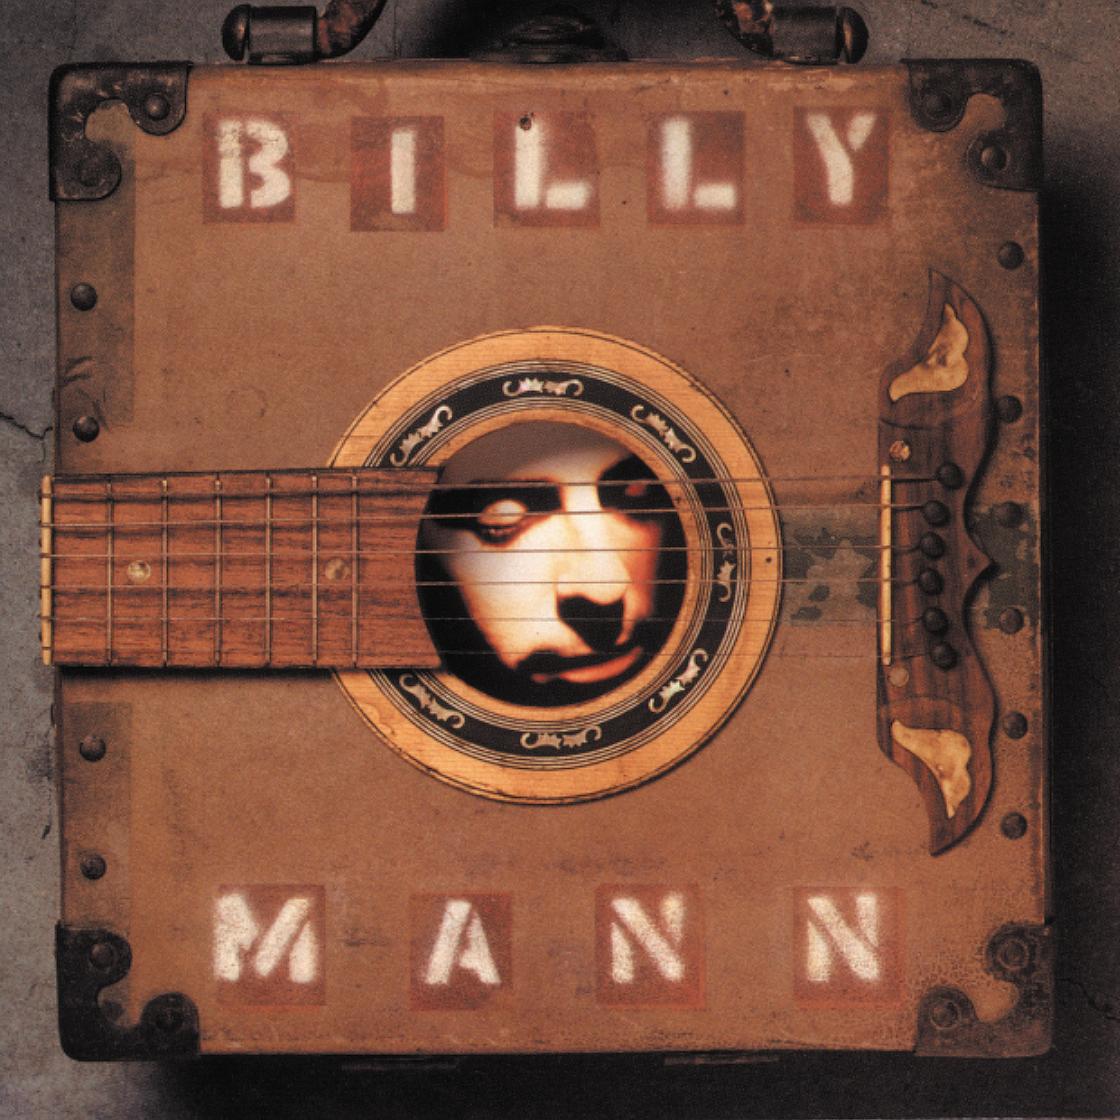 Billy Mann.jpg